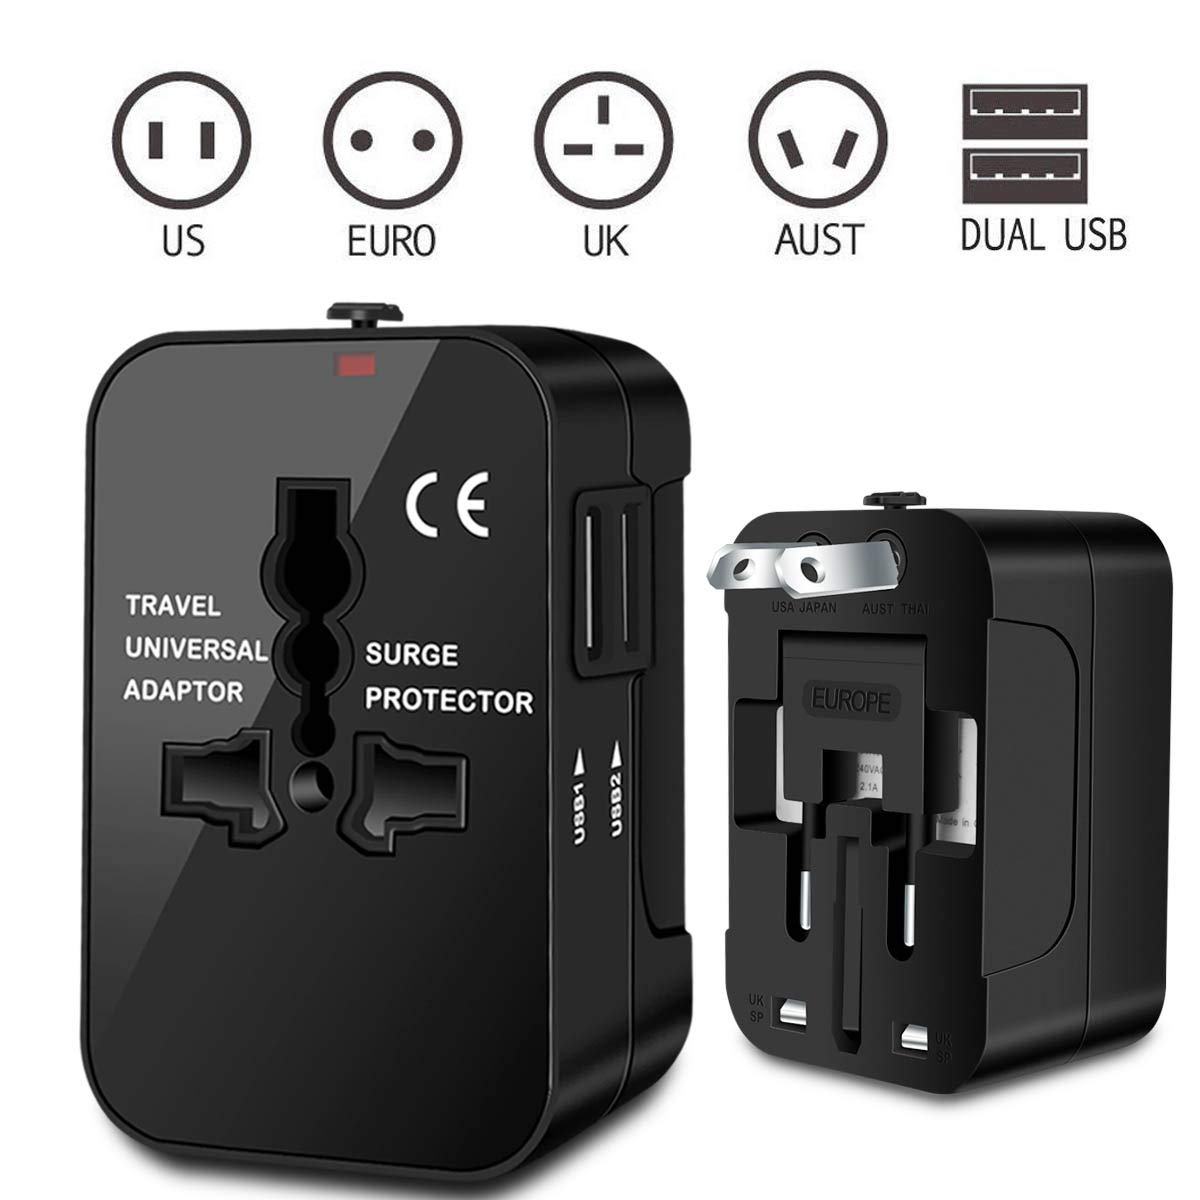 Zeuste Adaptador Enchufe Universal Enchufe de Viaje con 2 Puertos USB para EU UK USA China